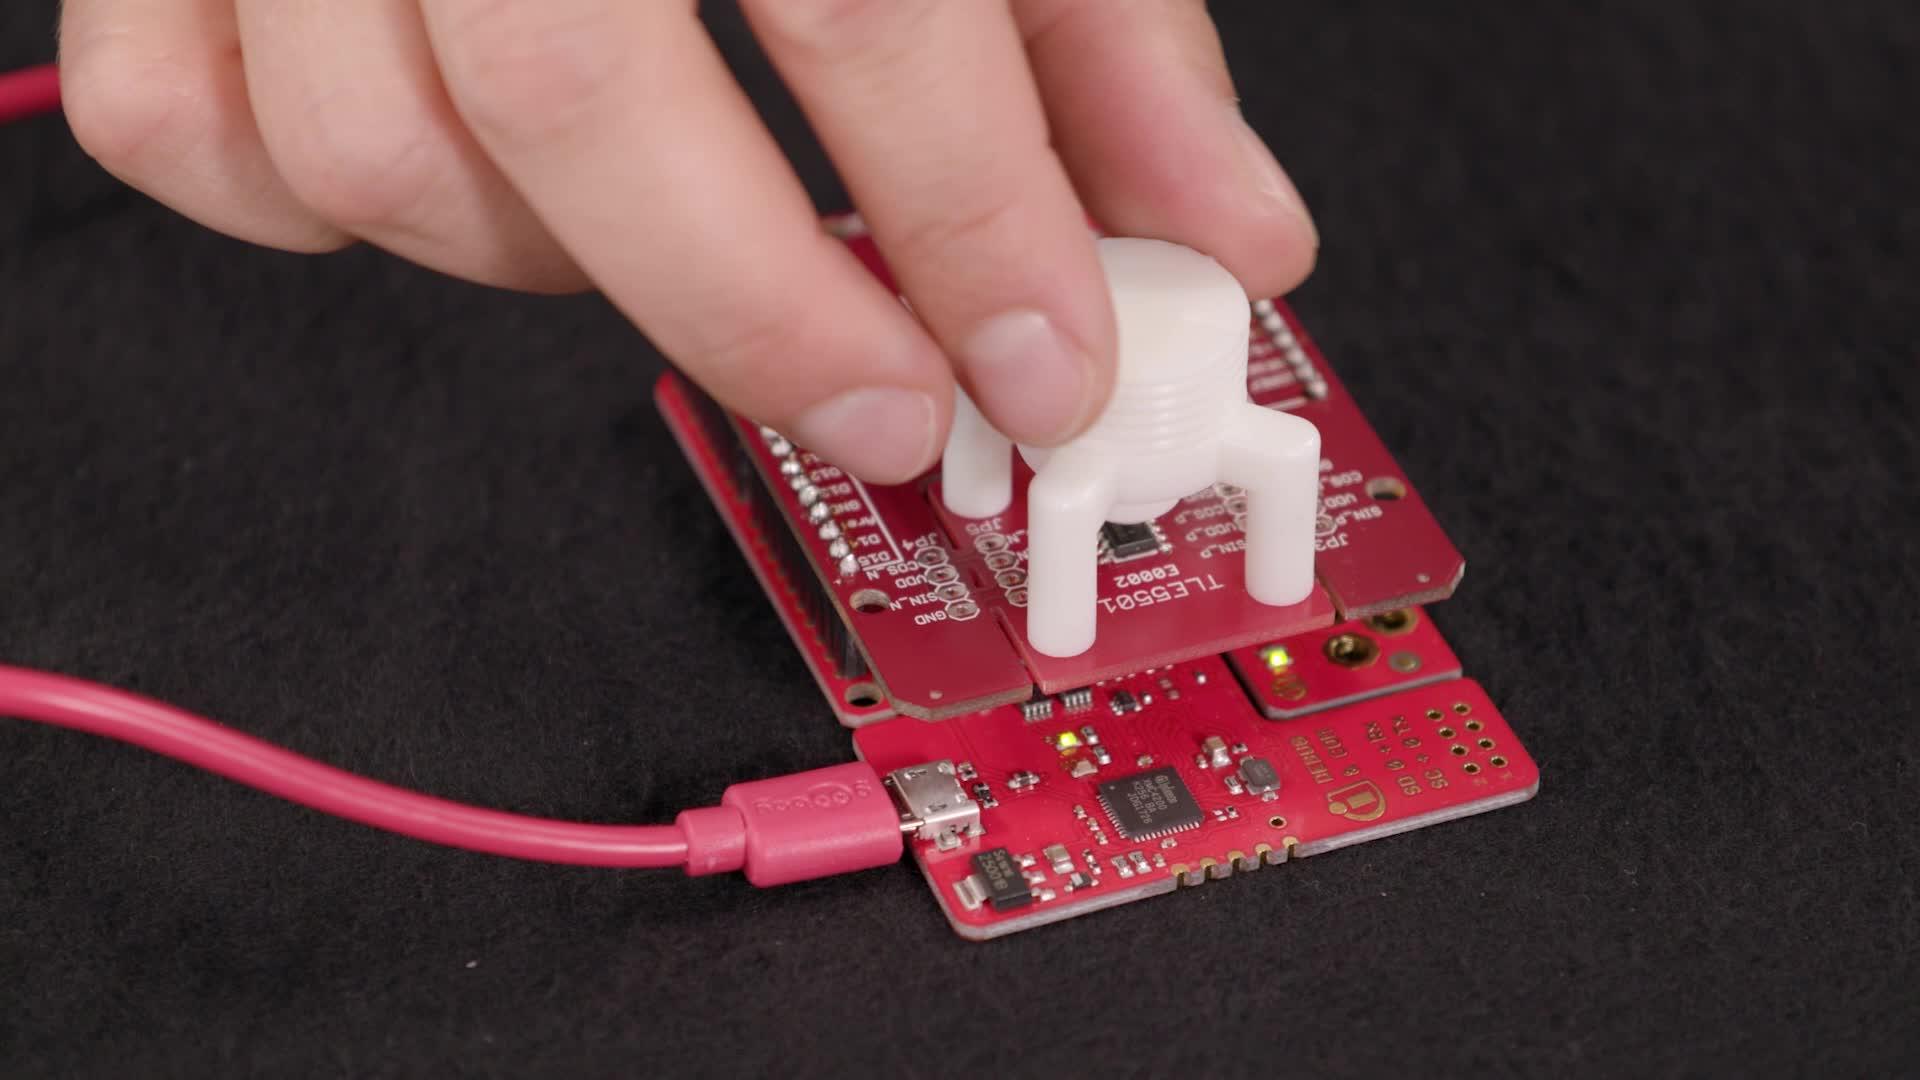 Unboxing the TLE5501 - XENSIV™ - magnetic TMR angle sensor